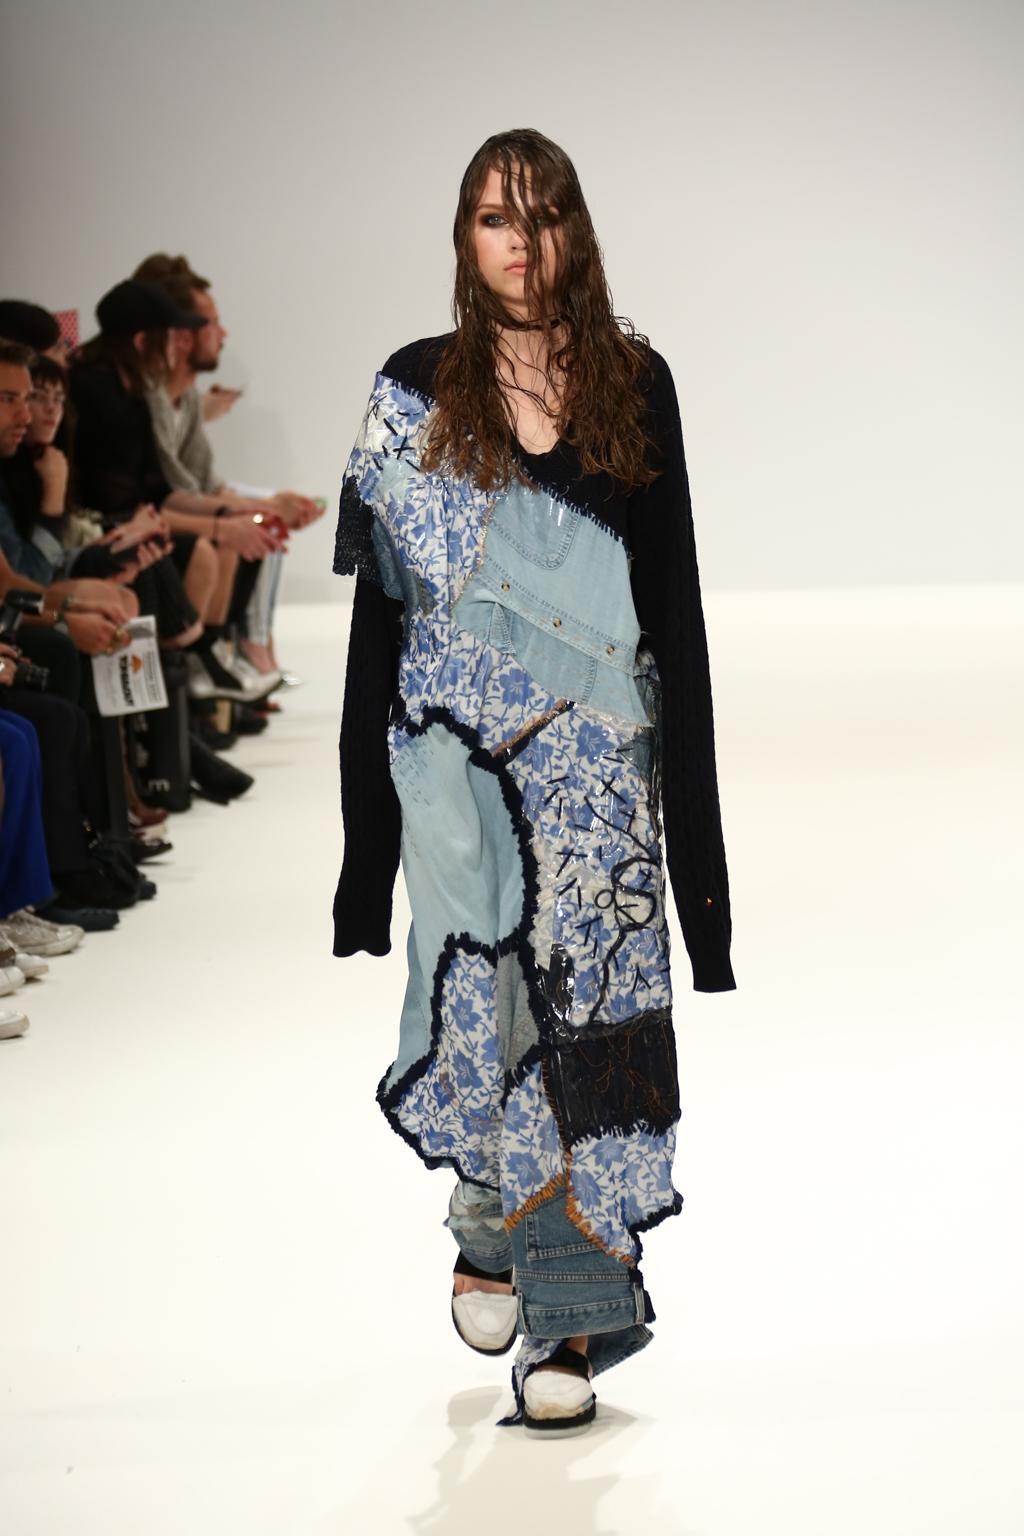 lfw-ss17-swedish-school-of-textiles-erol-birsen-the-upcoming-1-68